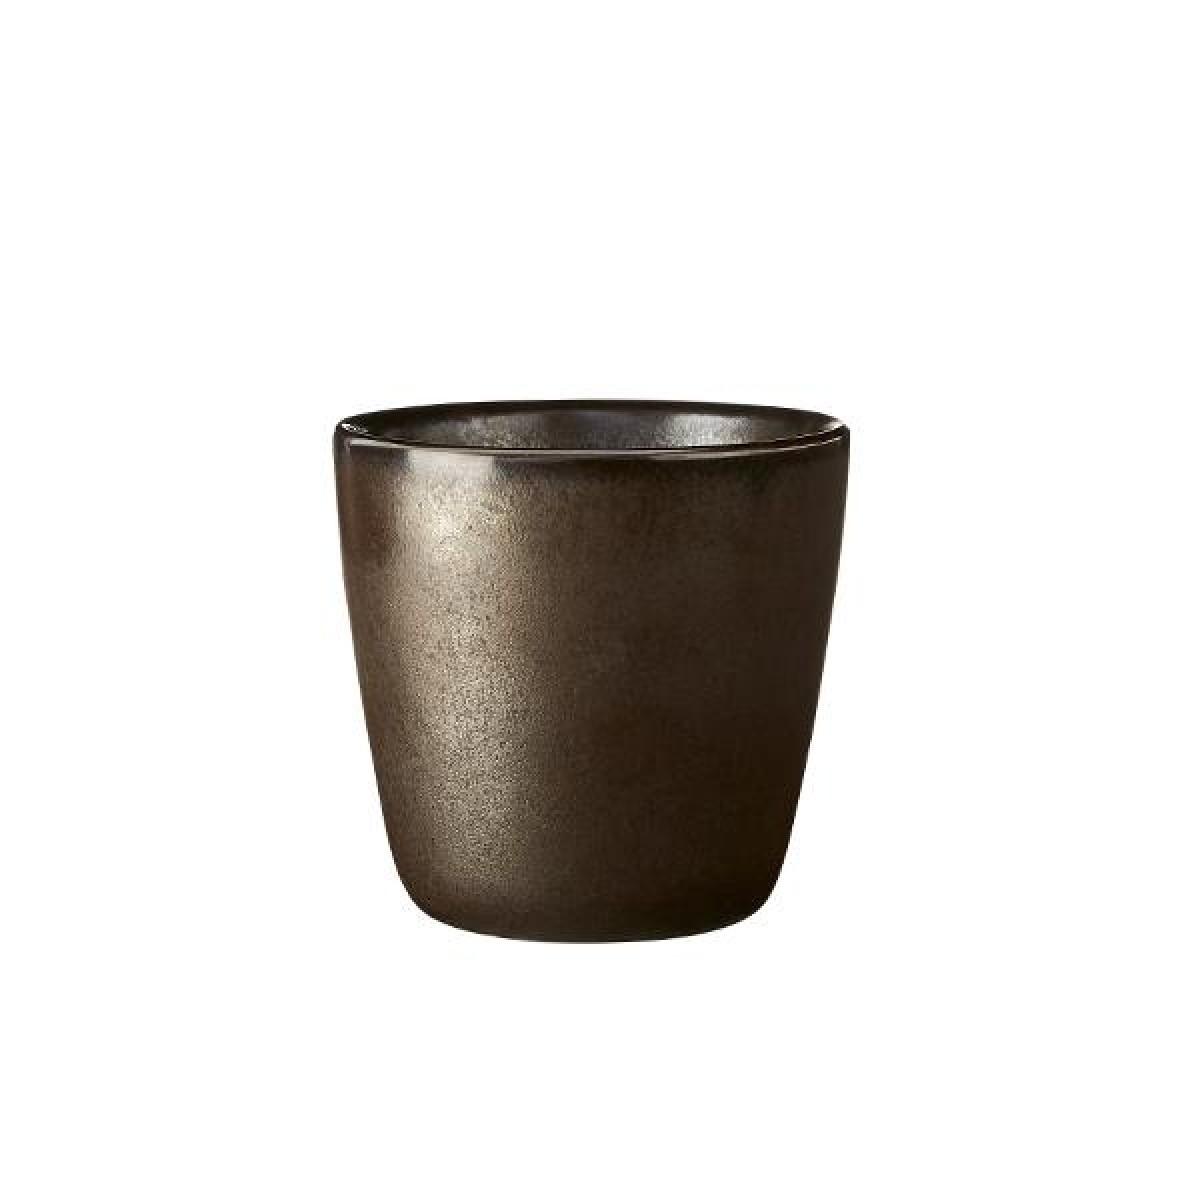 AIDA Raw krus u. hank 30 cl - metallic brown